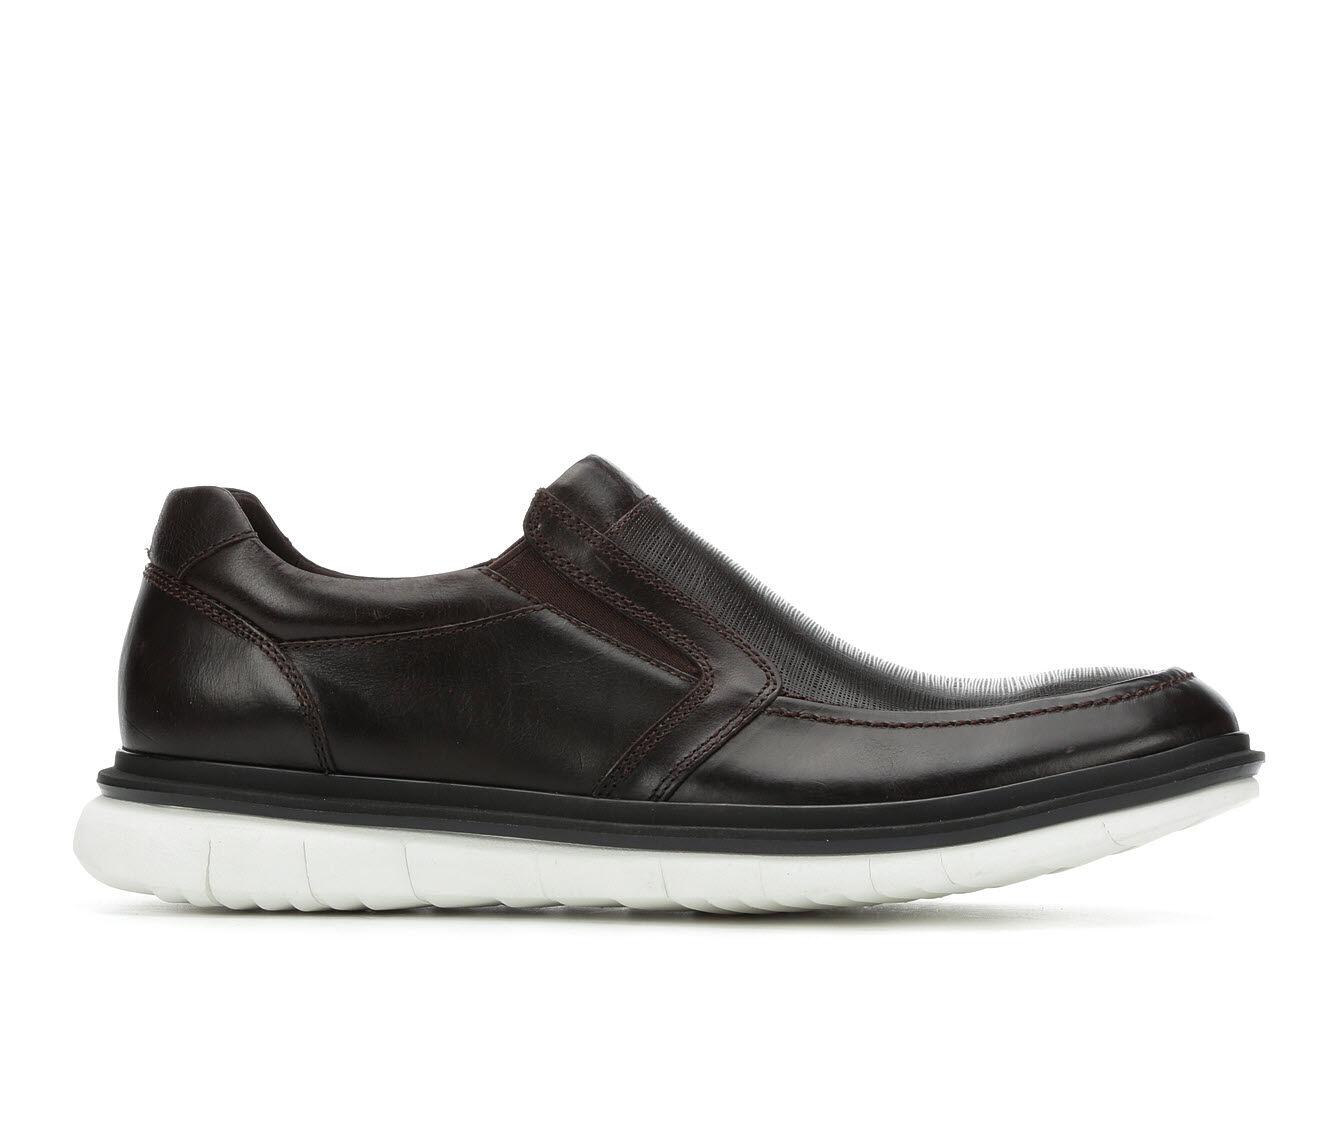 uk shoes_kd1310